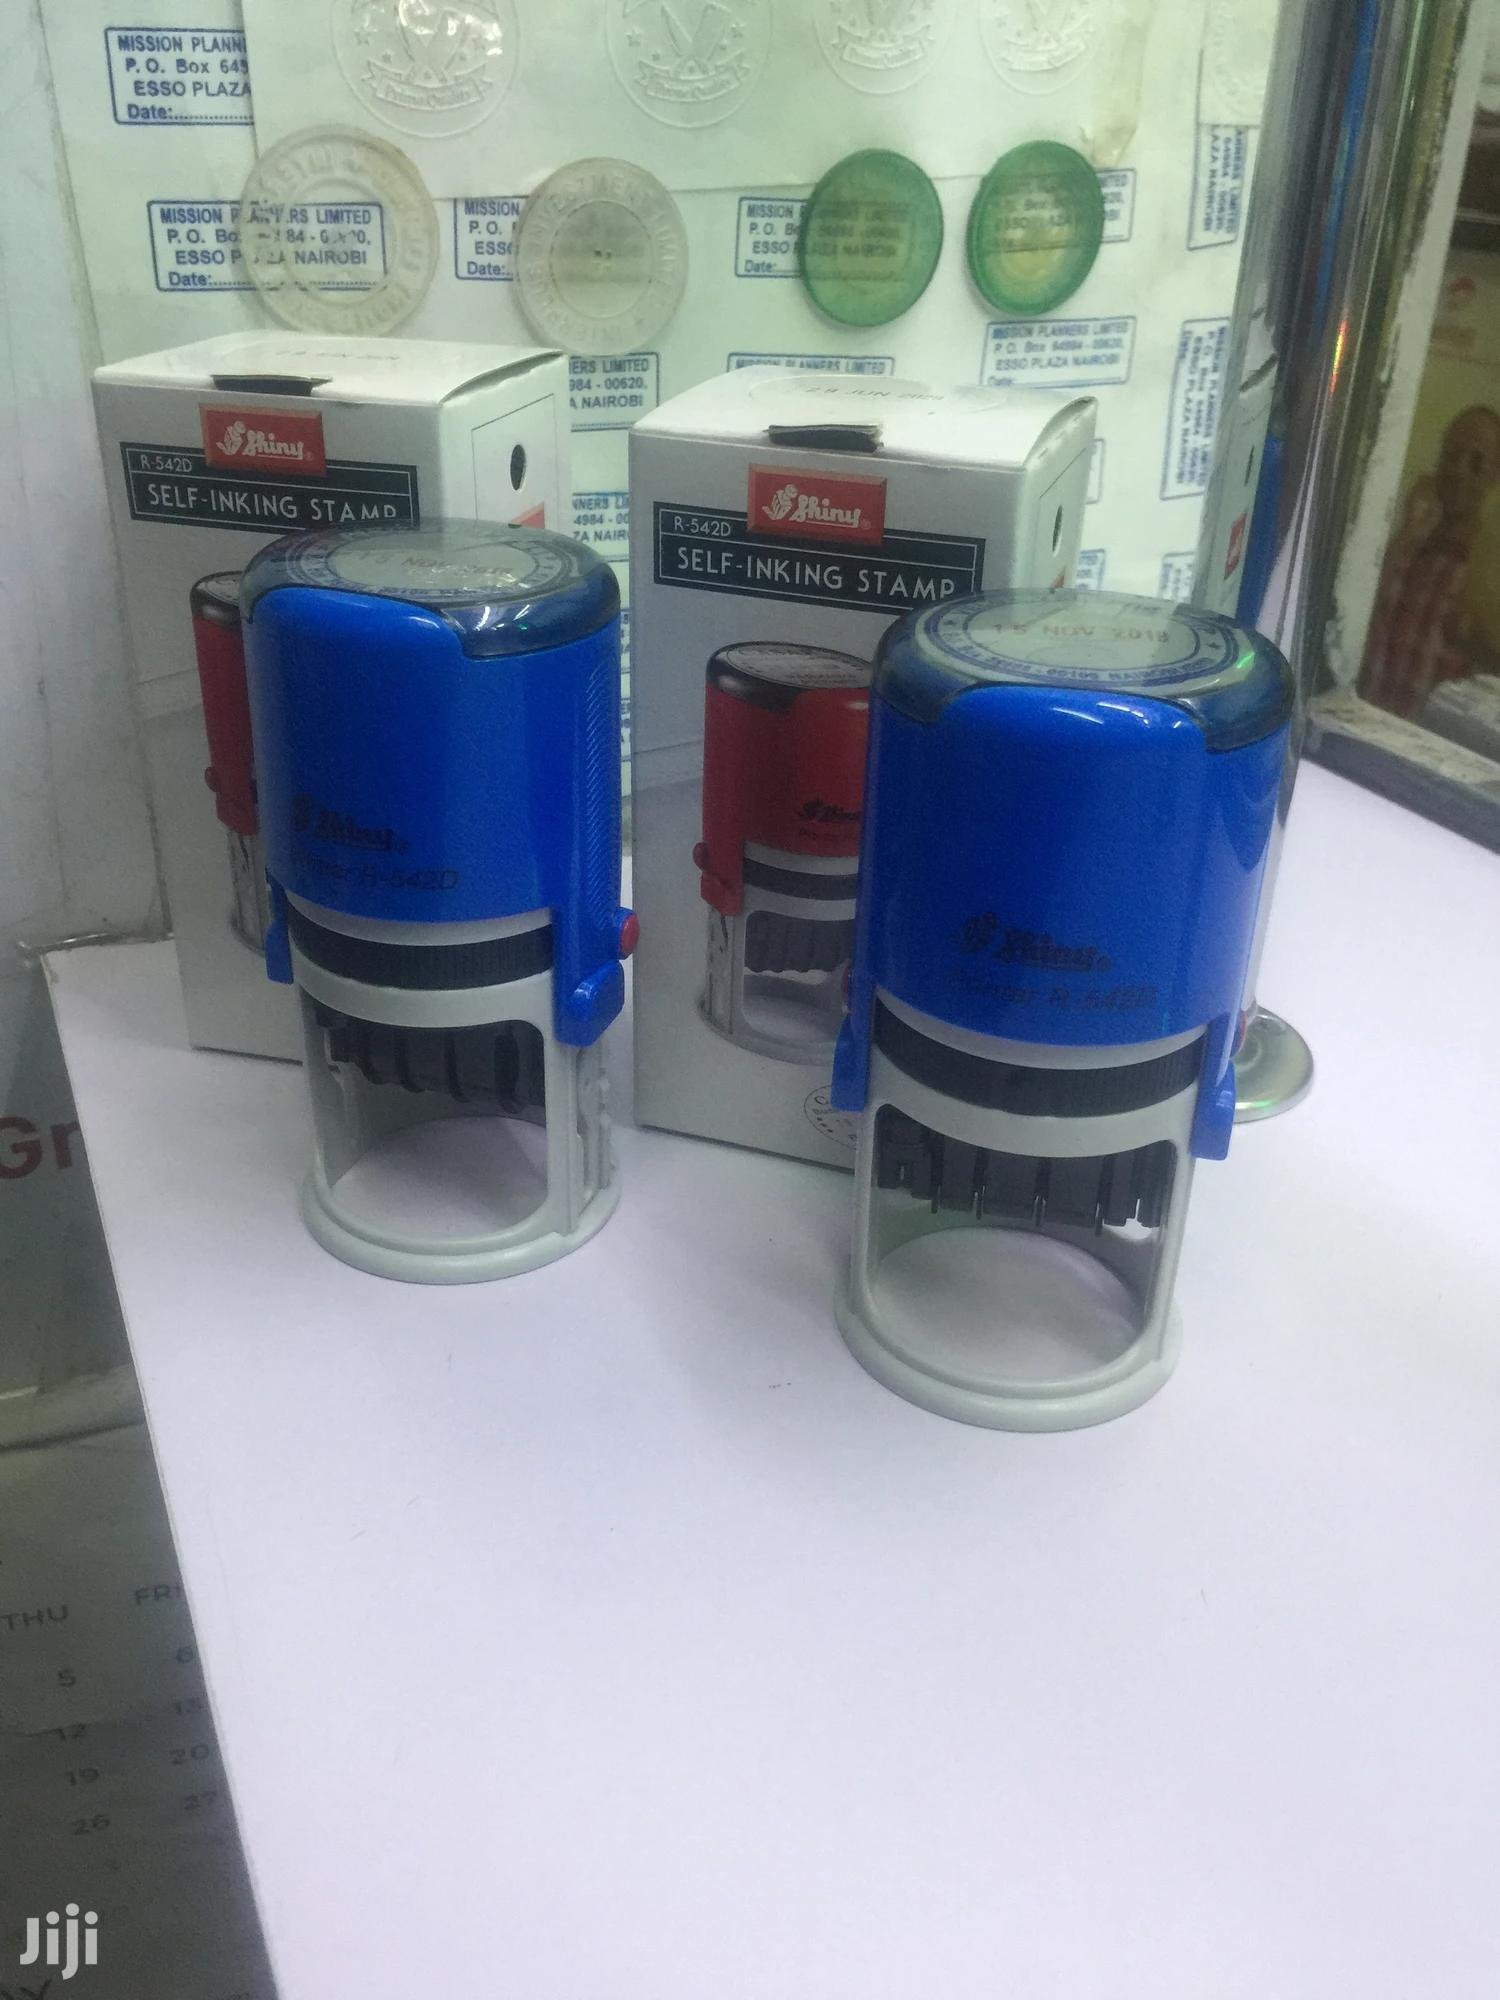 Rubber Stamps | Stationery for sale in Nairobi Central, Nairobi, Kenya